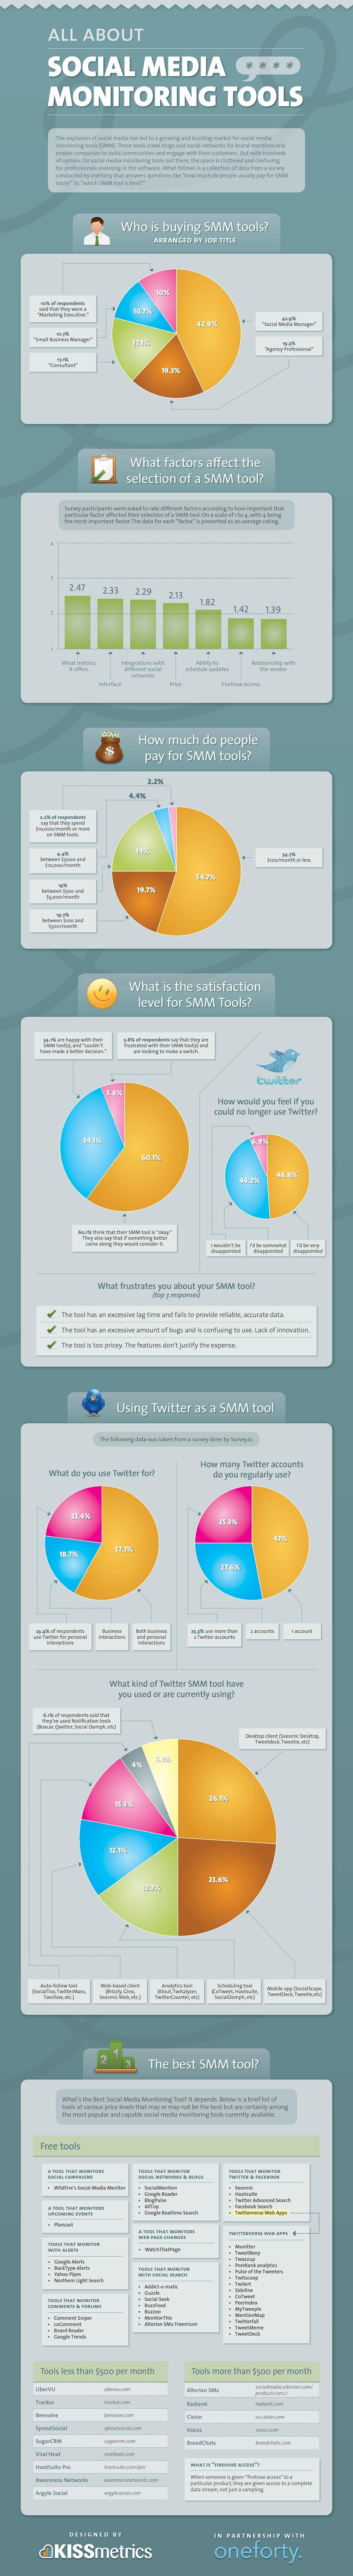 Social-Media-Monitoring-Tools-infographic